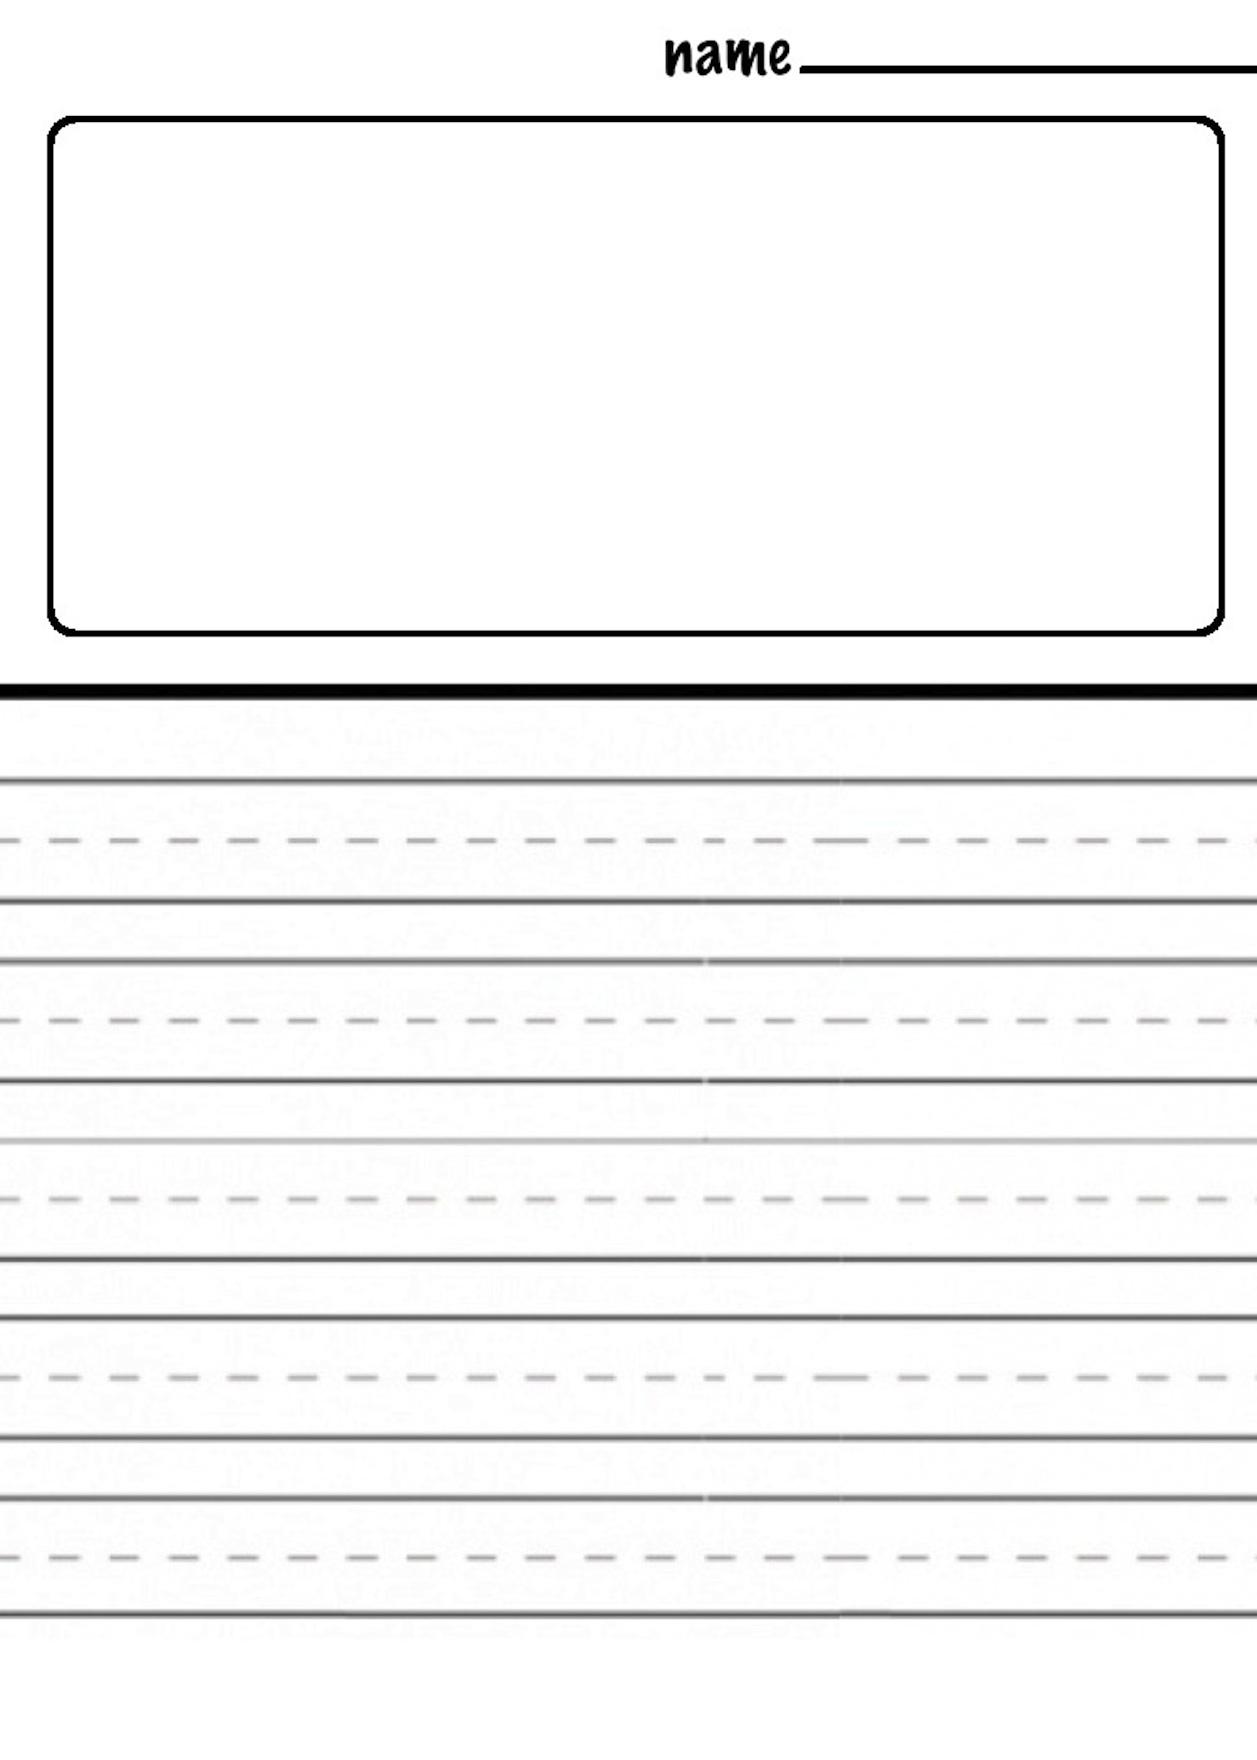 journaling templates